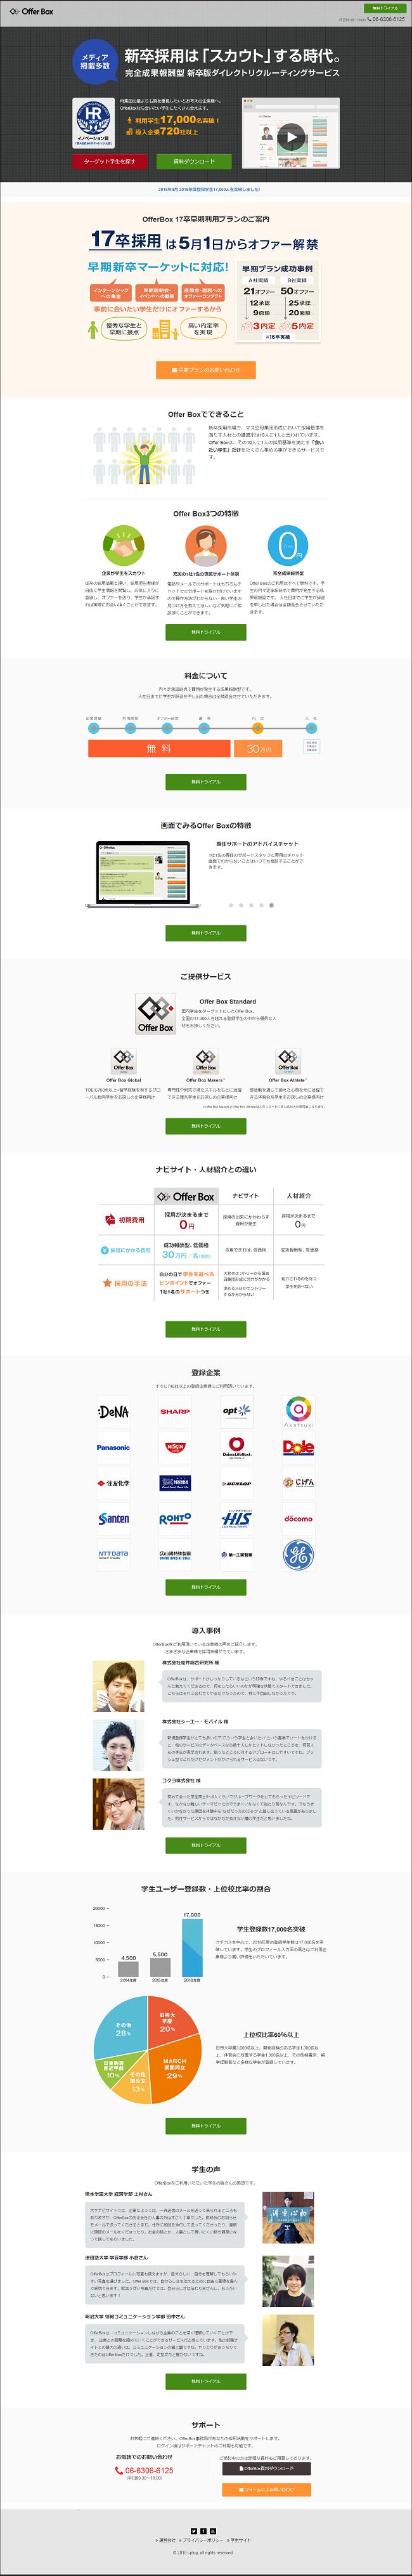 A8net,エーハチネット,アフィリエイト,ASP,アフィリエイトサービスプロバイダー,広告主